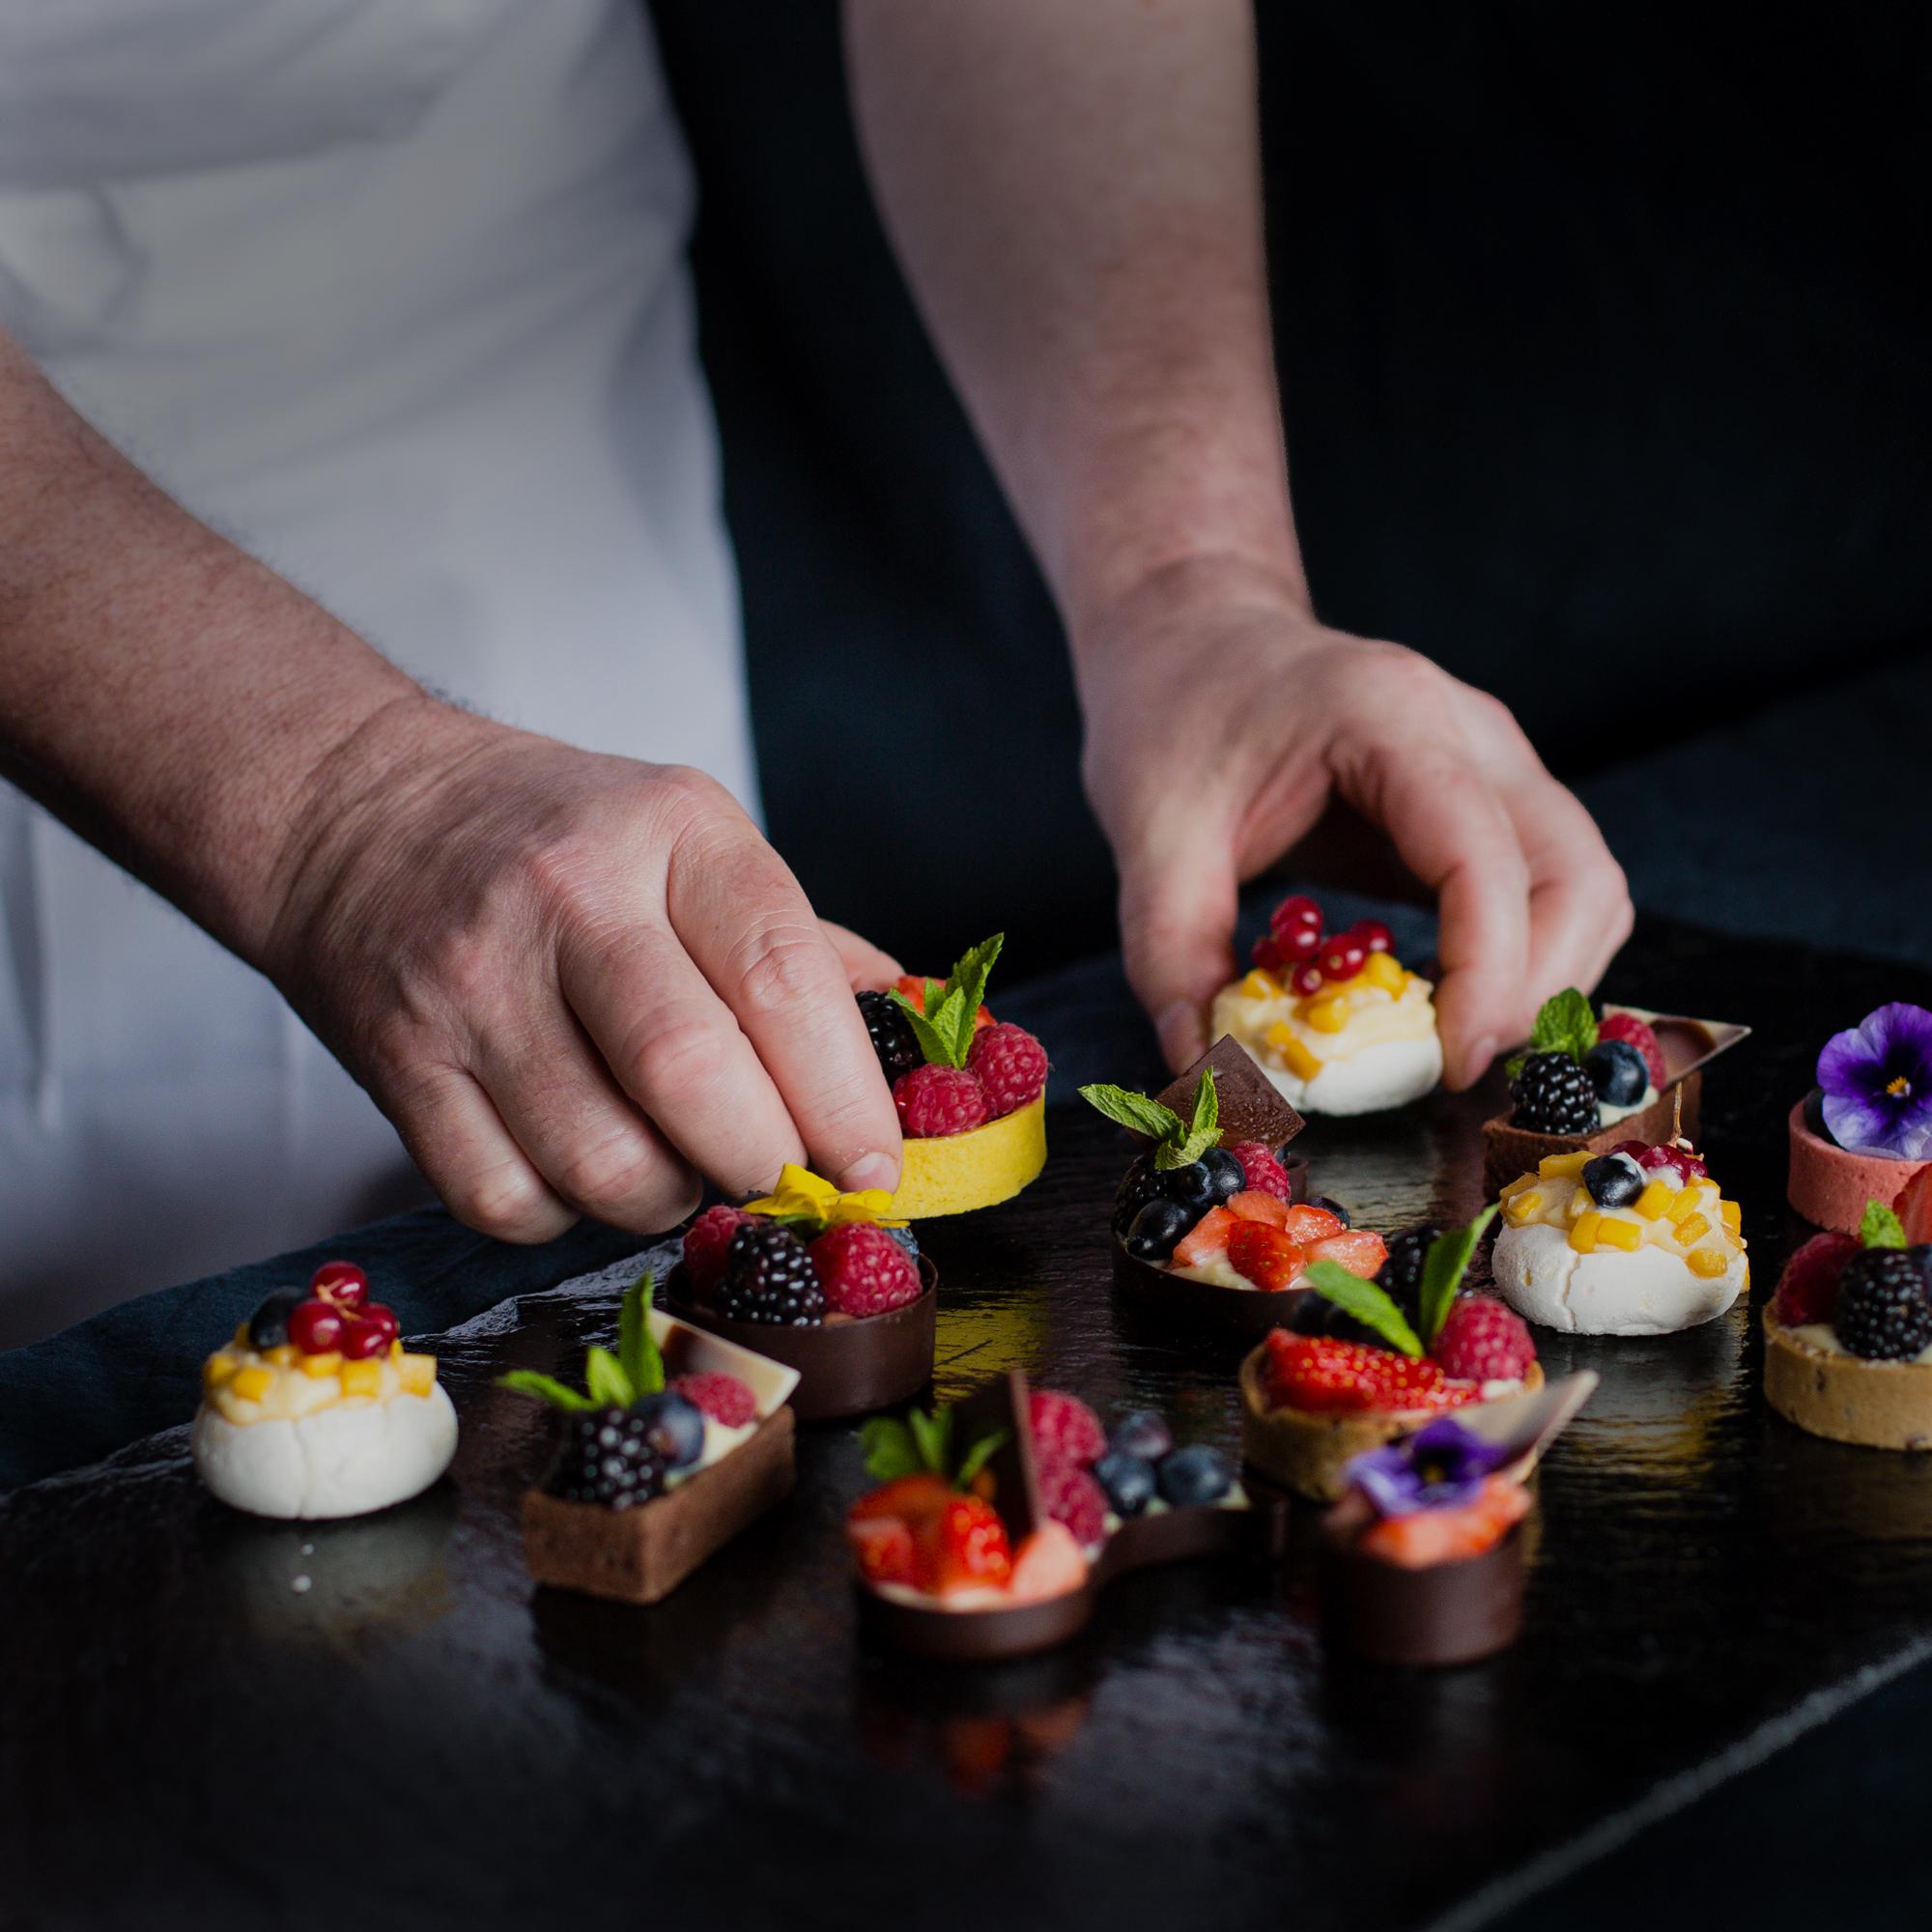 032 Master Chef Web 2019© Anita Murphy 2019_LO.jpg